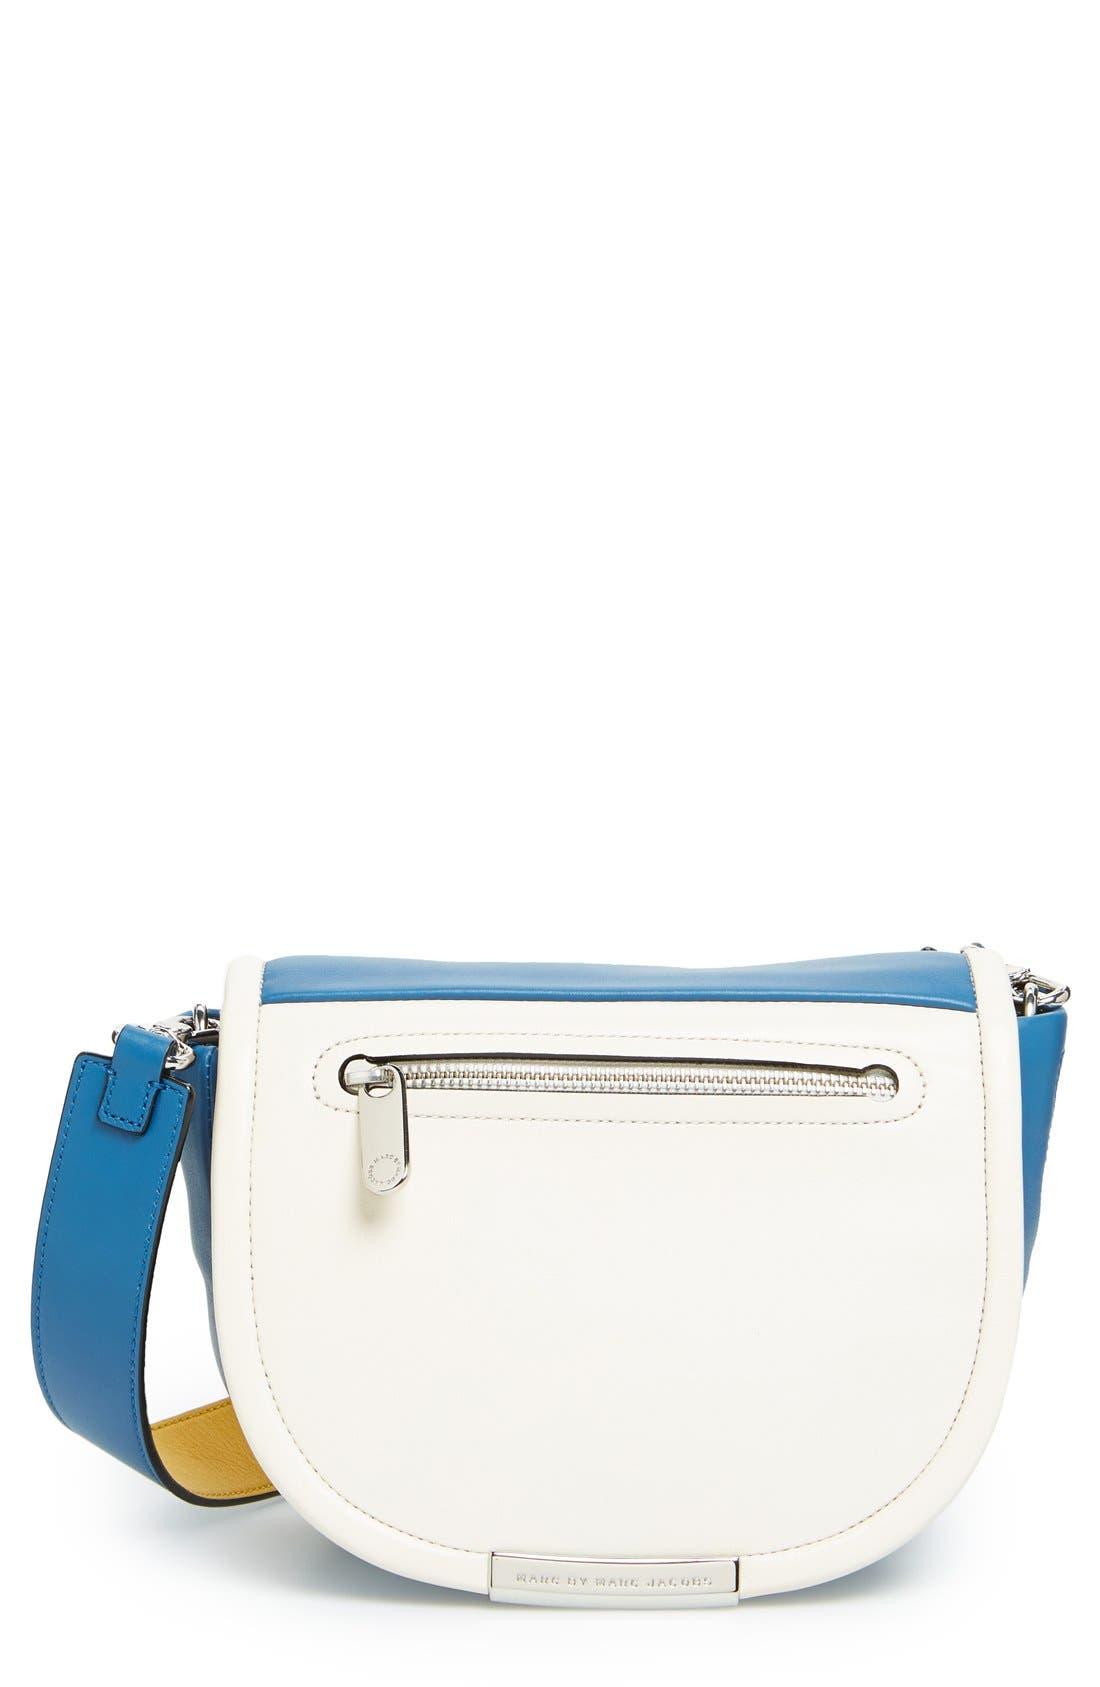 MARC BY MARC JACOBS 'Luna' Crossbody Bag,                         Main,                         color, Bluestone Multi